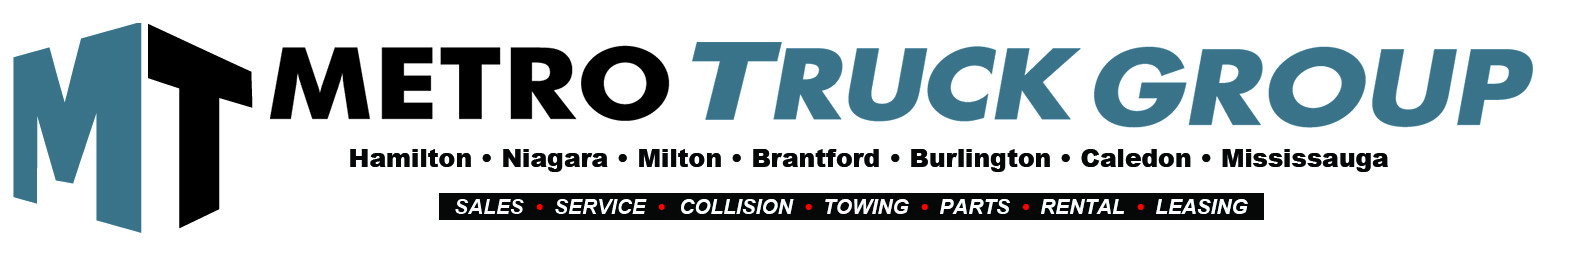 Metro Truck Group